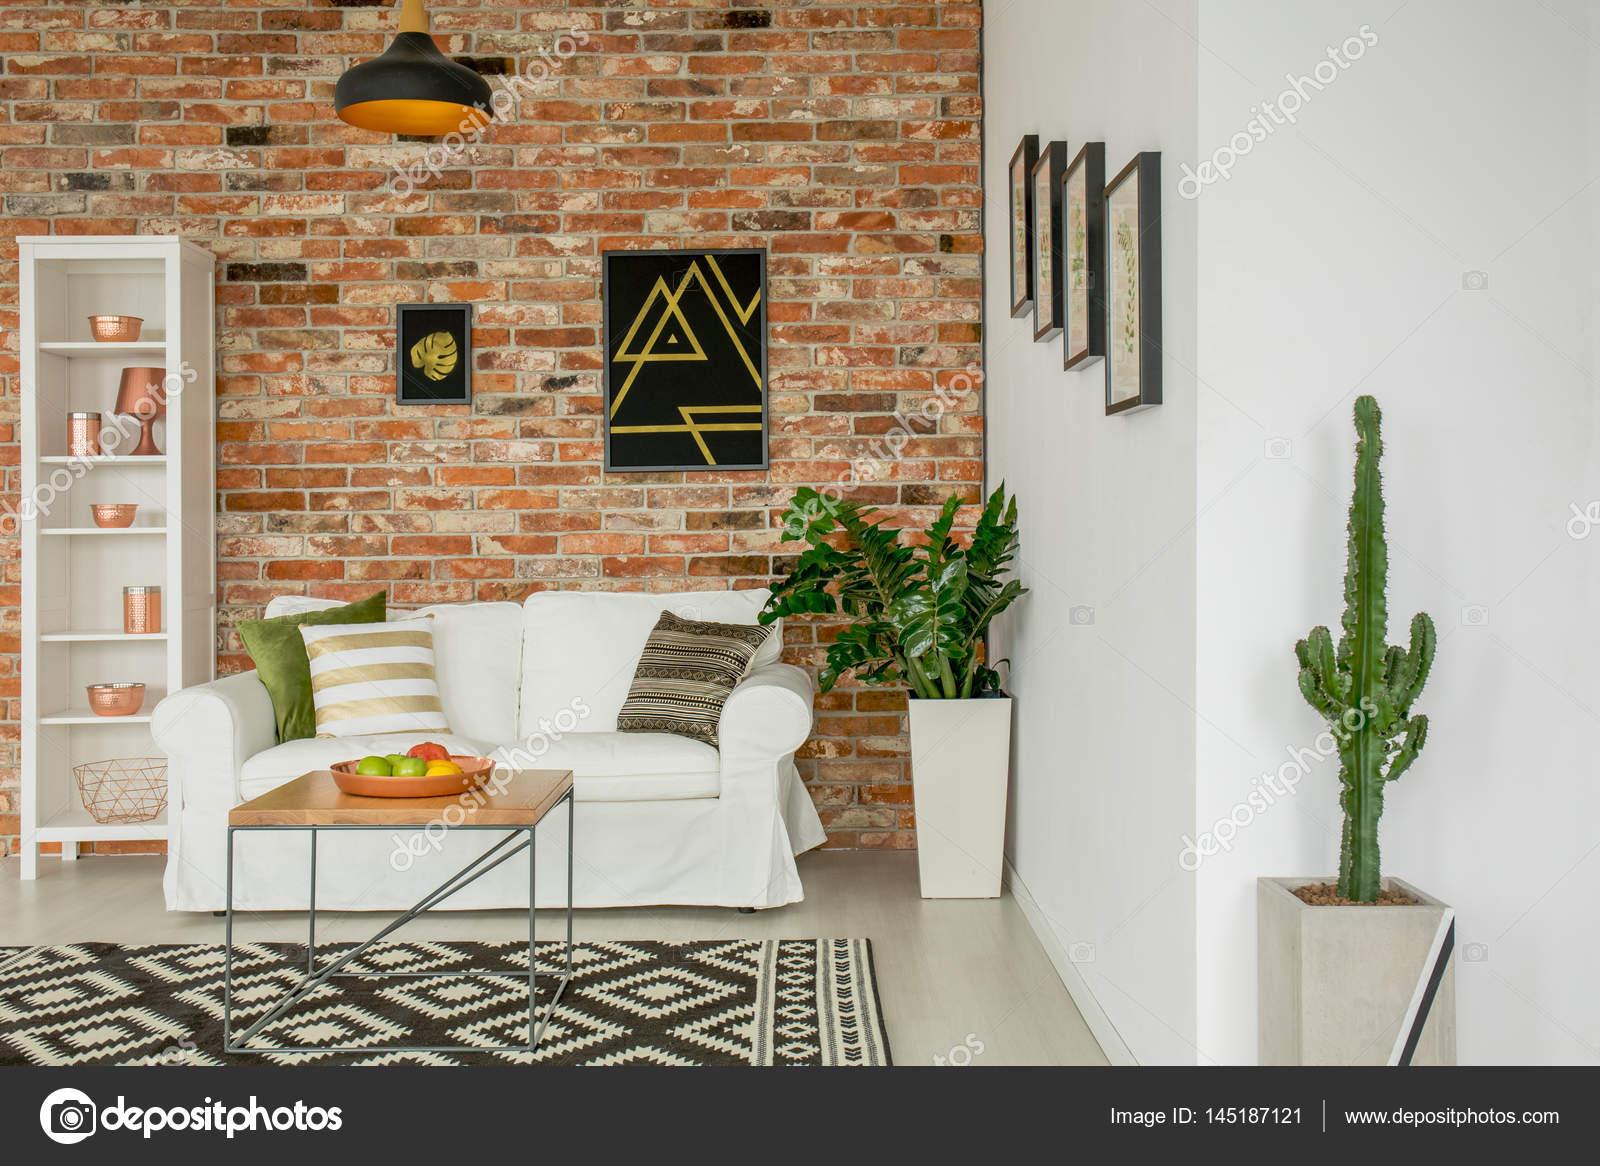 Planten In Woonkamer : Planten woonkamer woonkamer decor planten ronpaulhemp